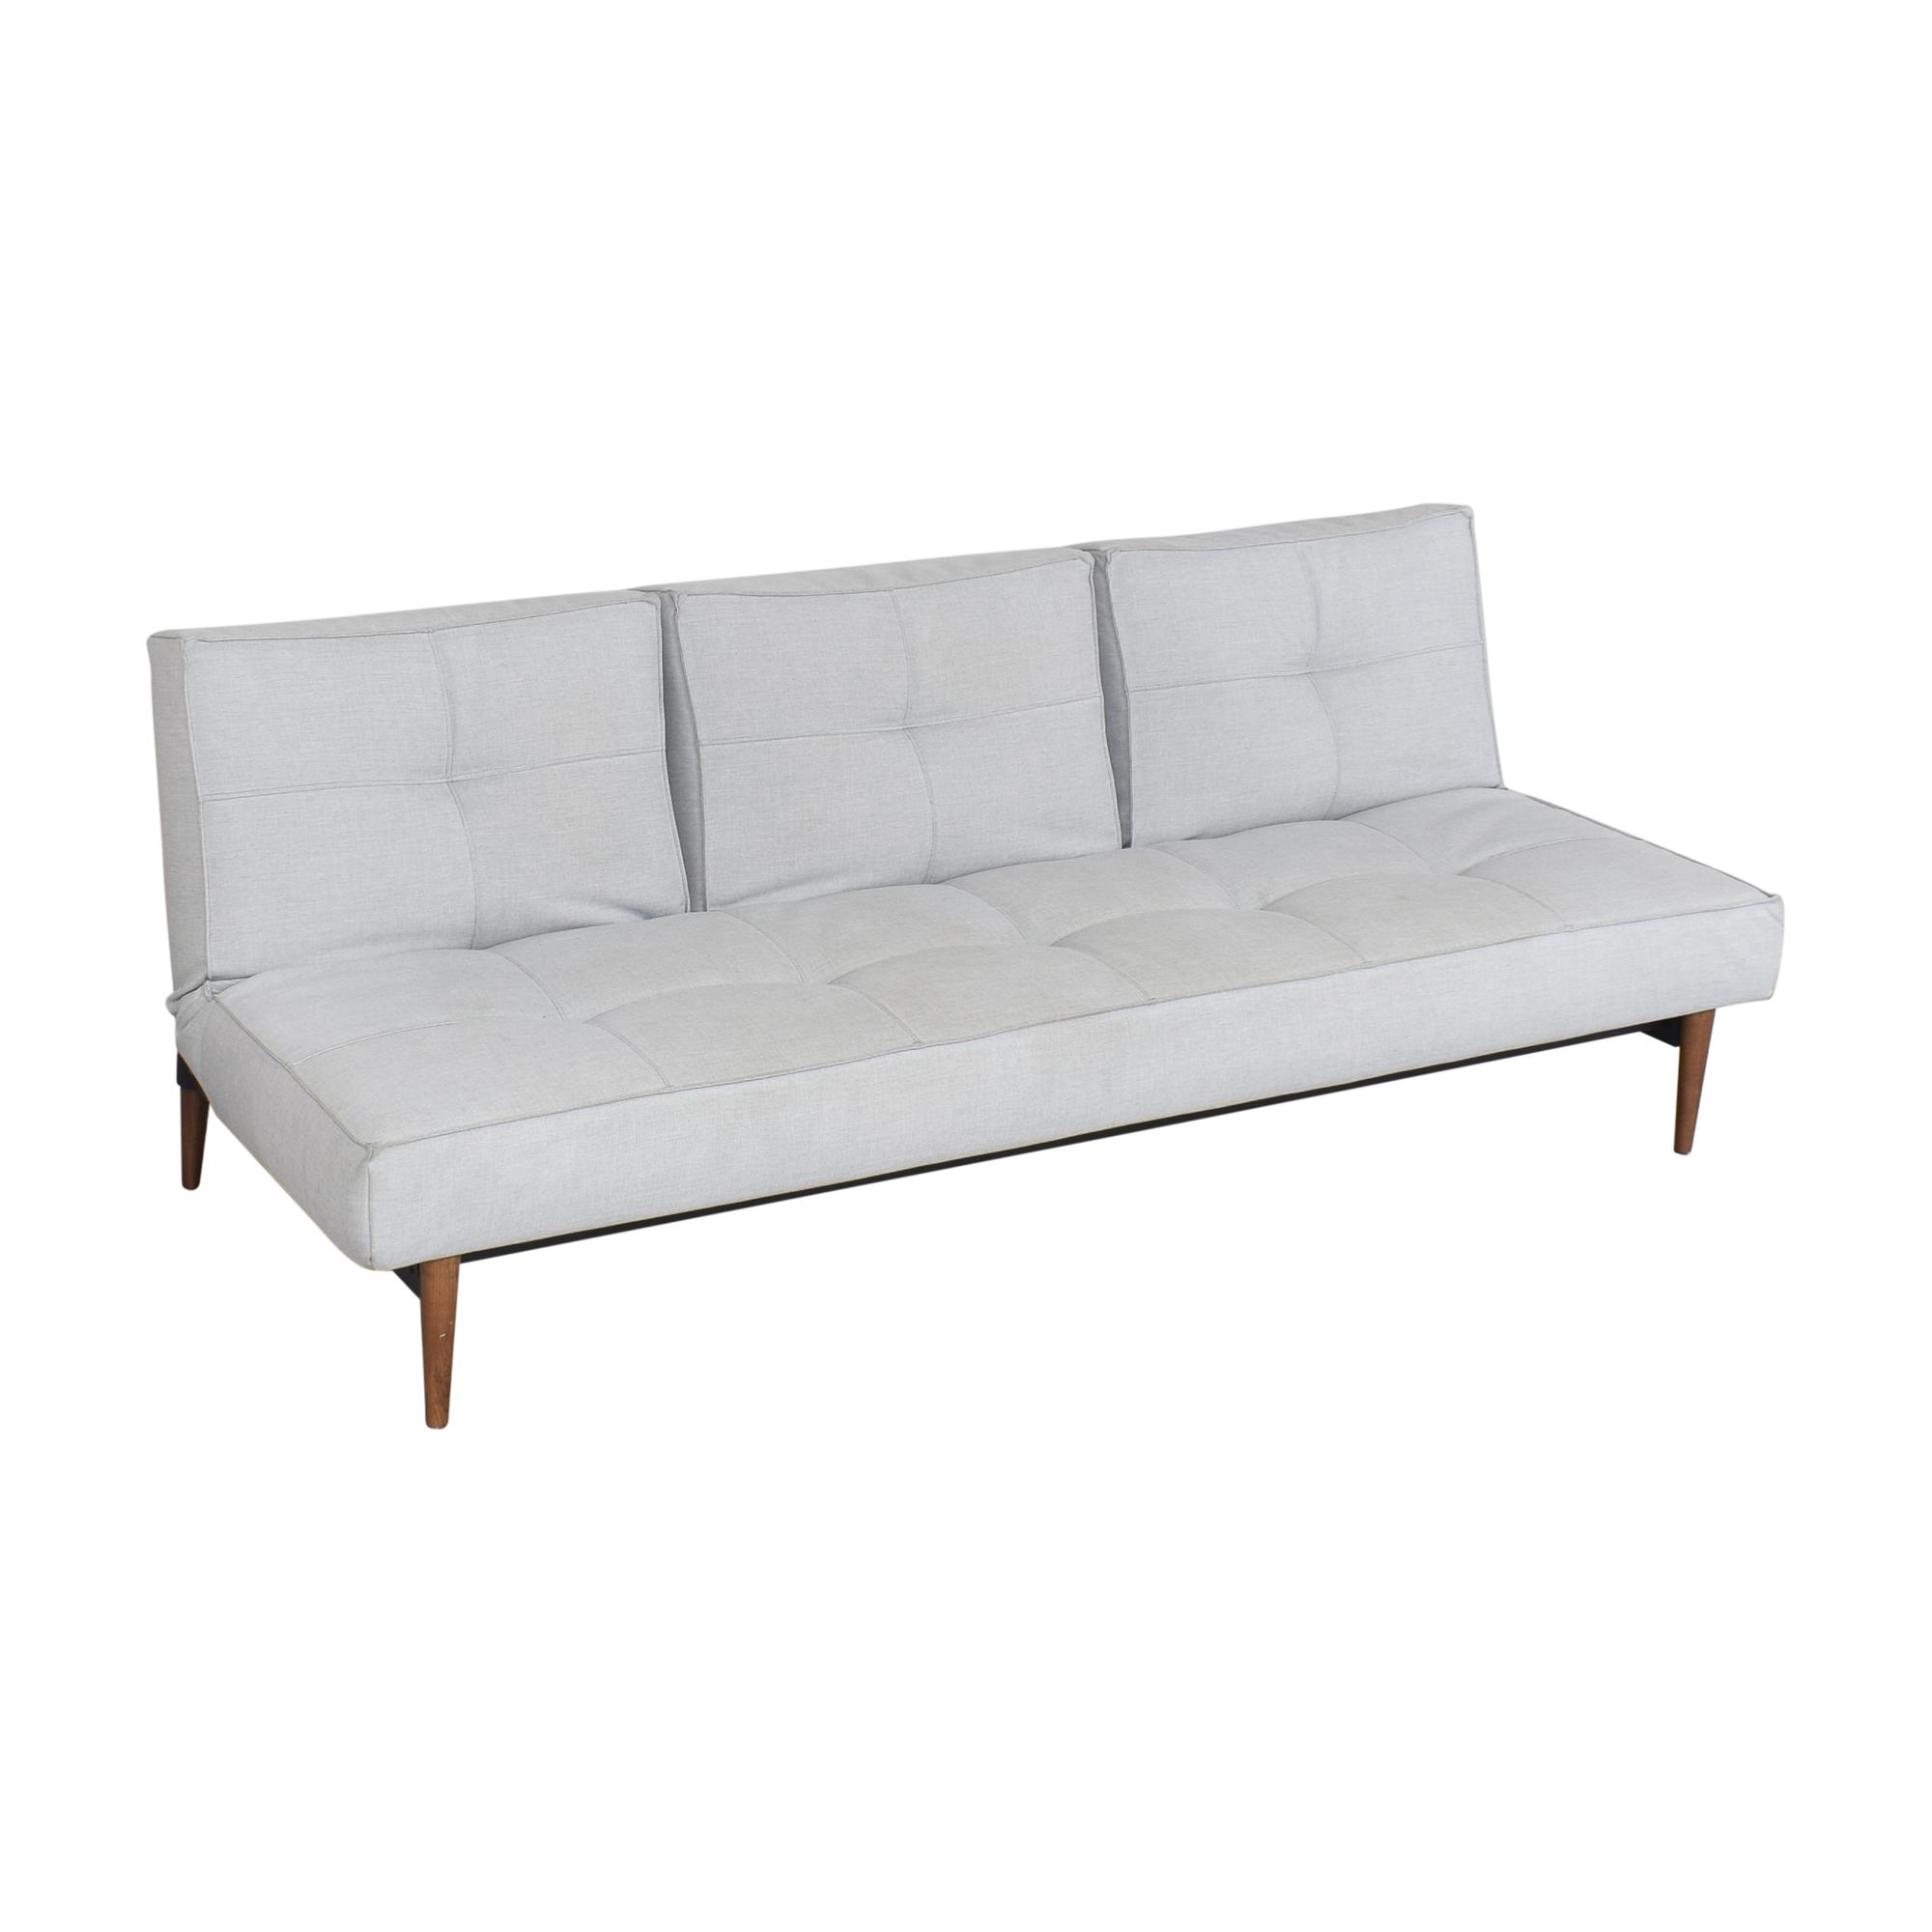 shop Innovation Living Convertible Sofa Bed Innovation Living Sofas